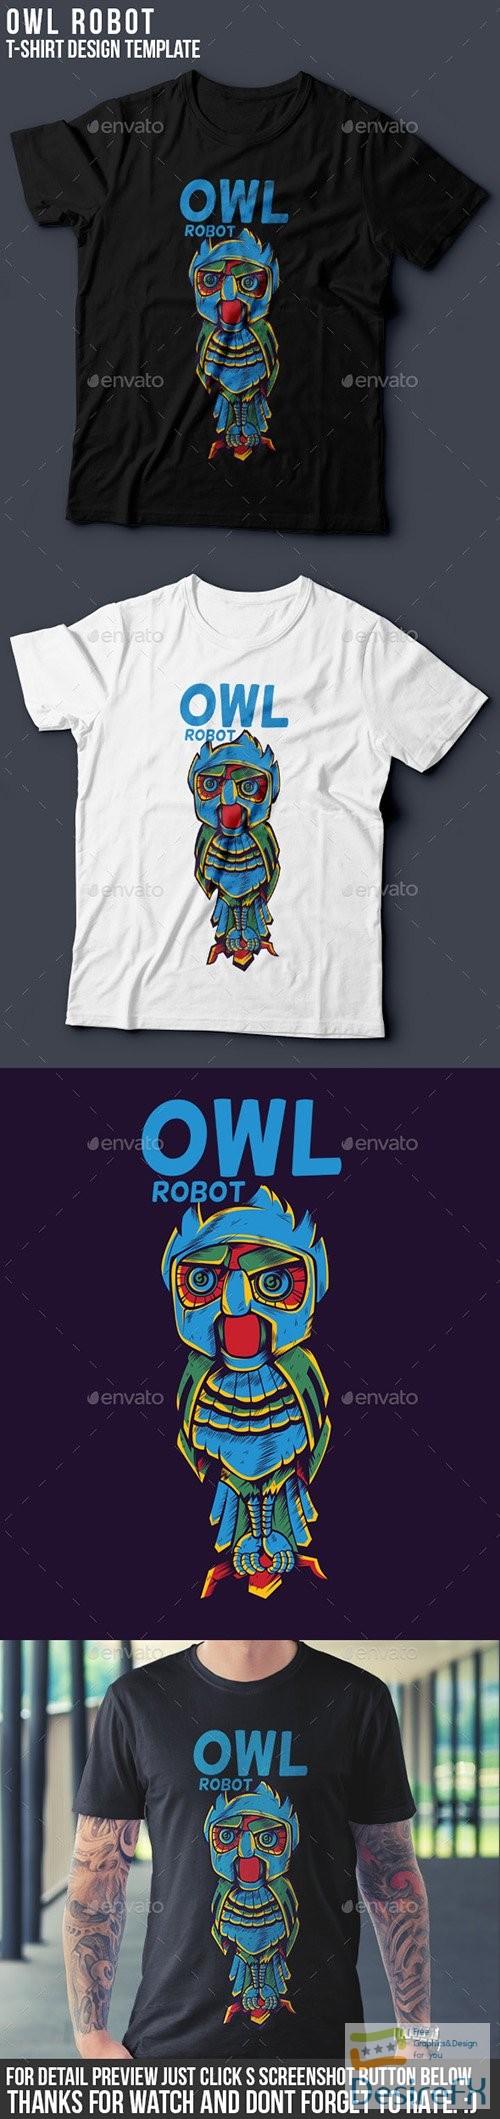 t-shirts-prints - Owl Robot 9516420